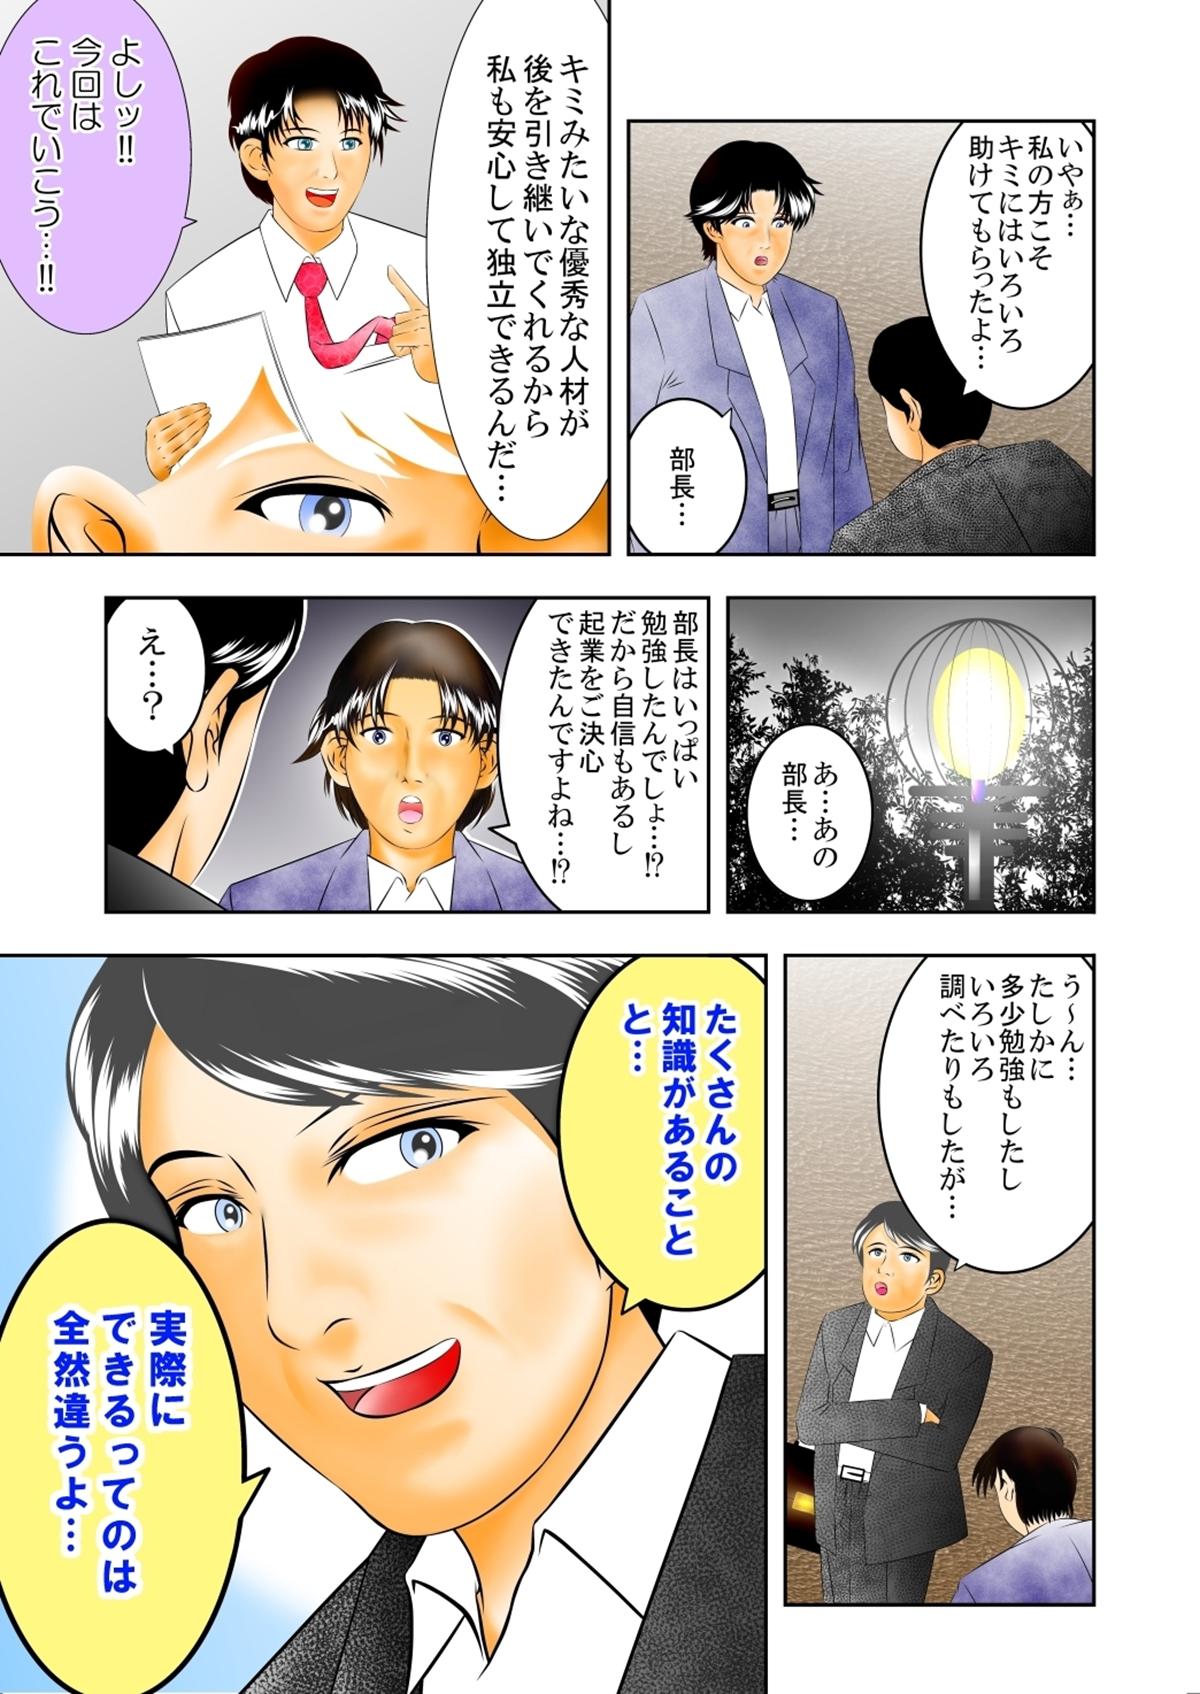 《P-COACH》体験漫画「47歳 ある営業企画課長の場合」P3